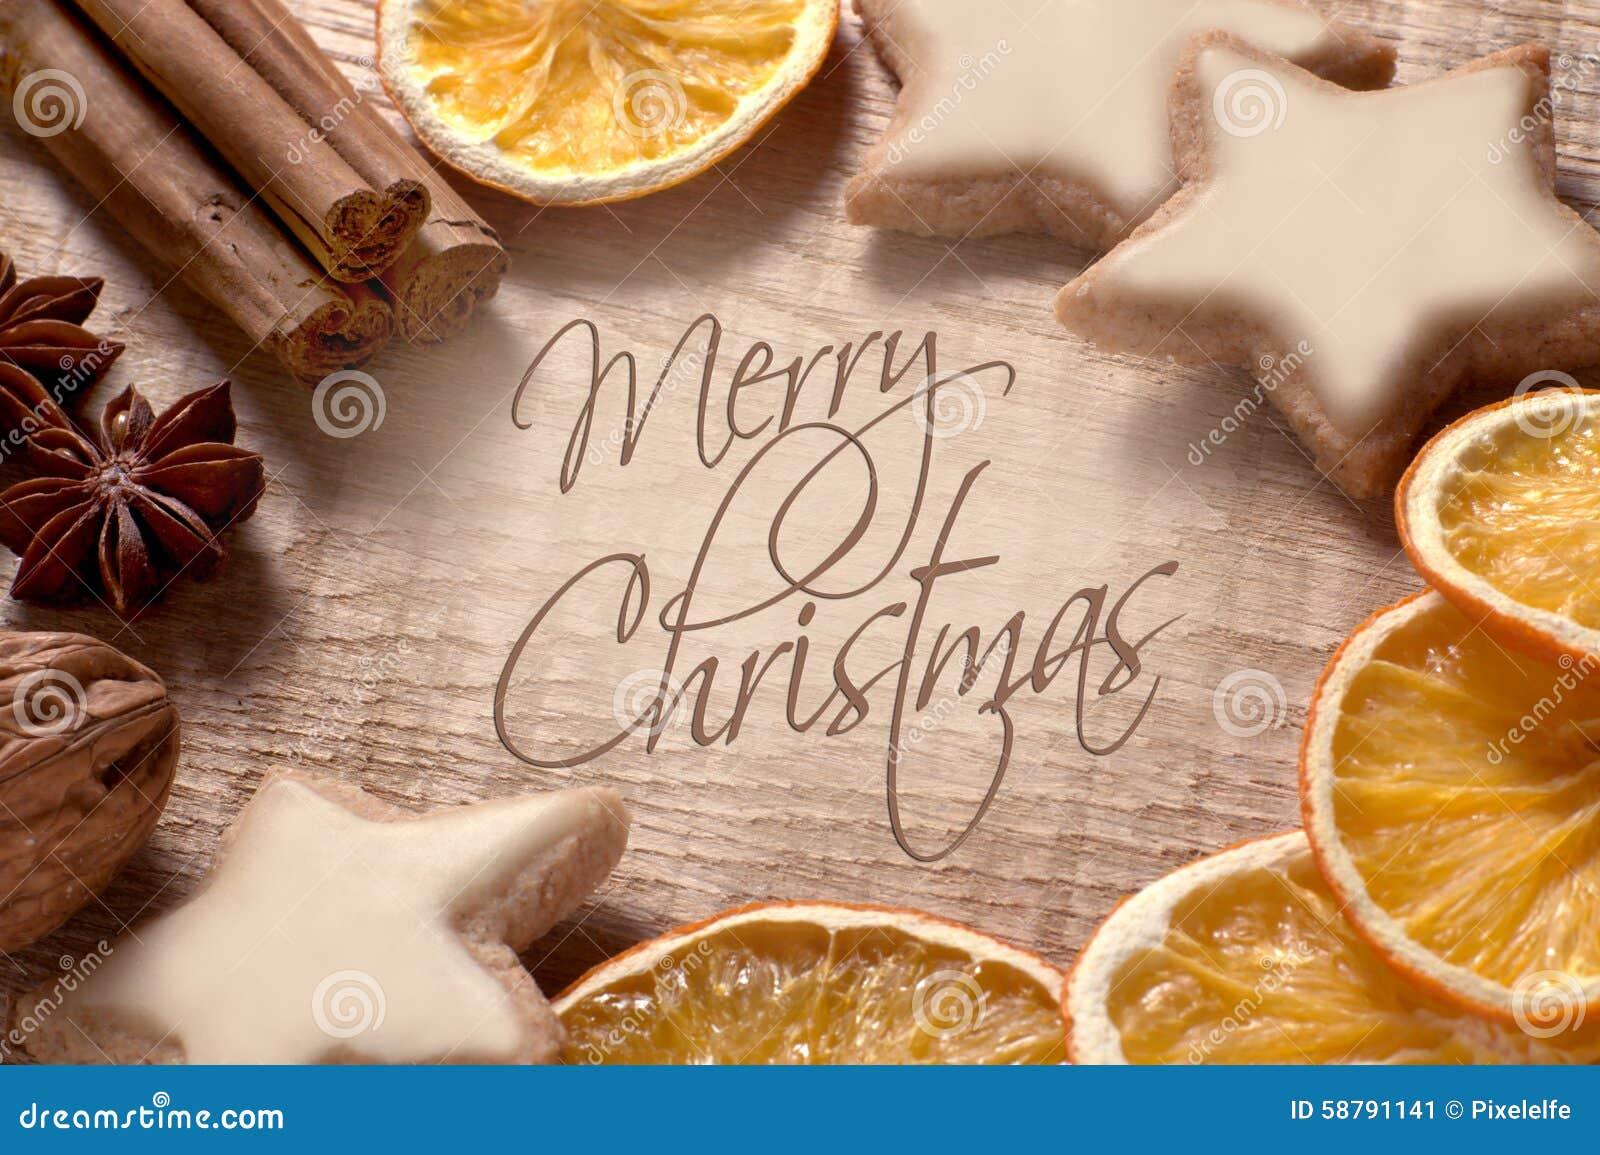 Christmas Greetings Merry Christmas Stock Image Image Of Merry